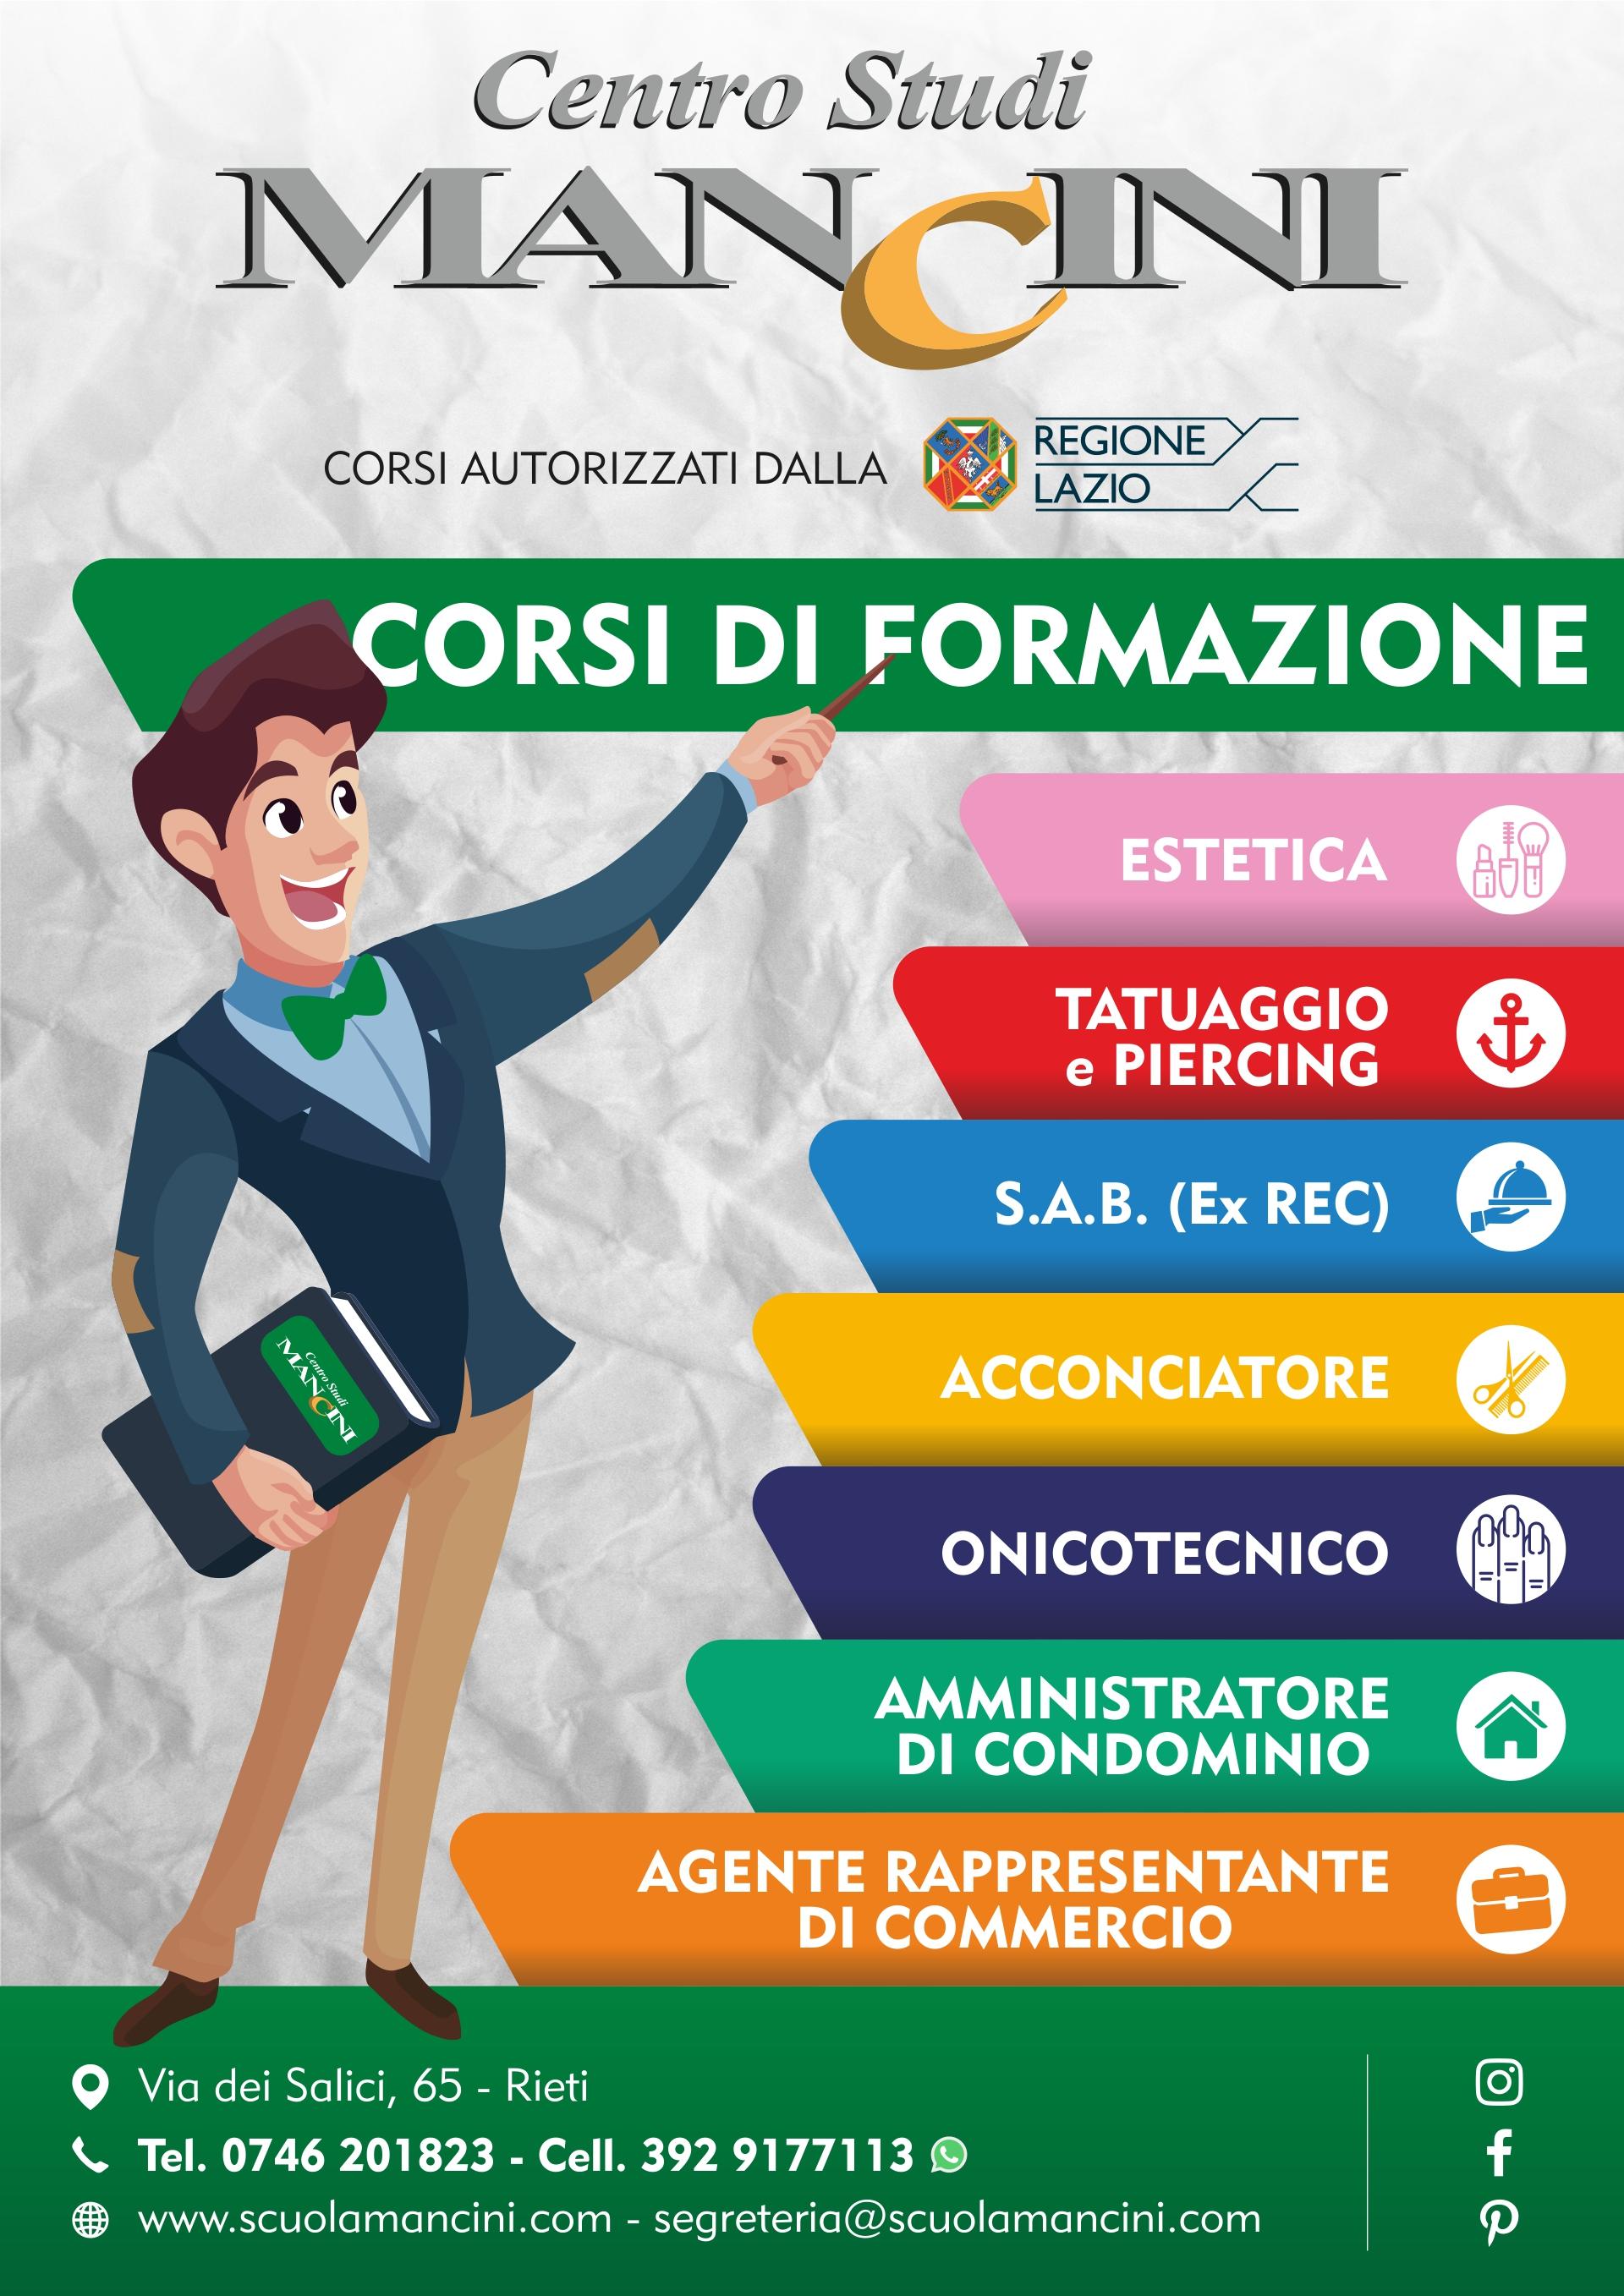 Locandina Centro Studi Mancini